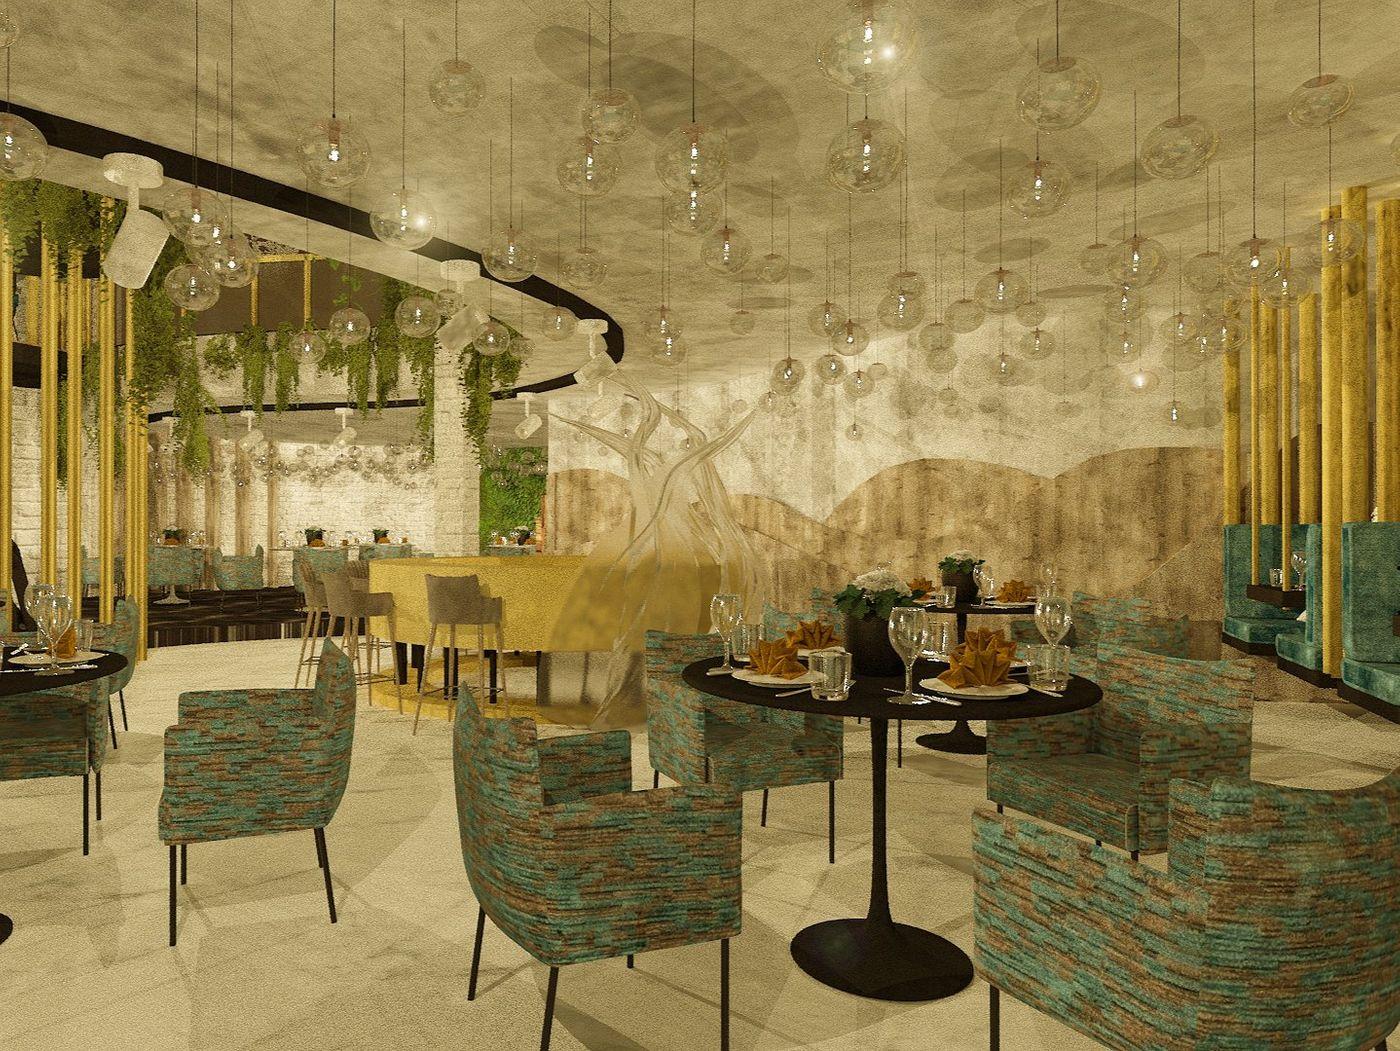 Restaurant Design - Le Bernardin